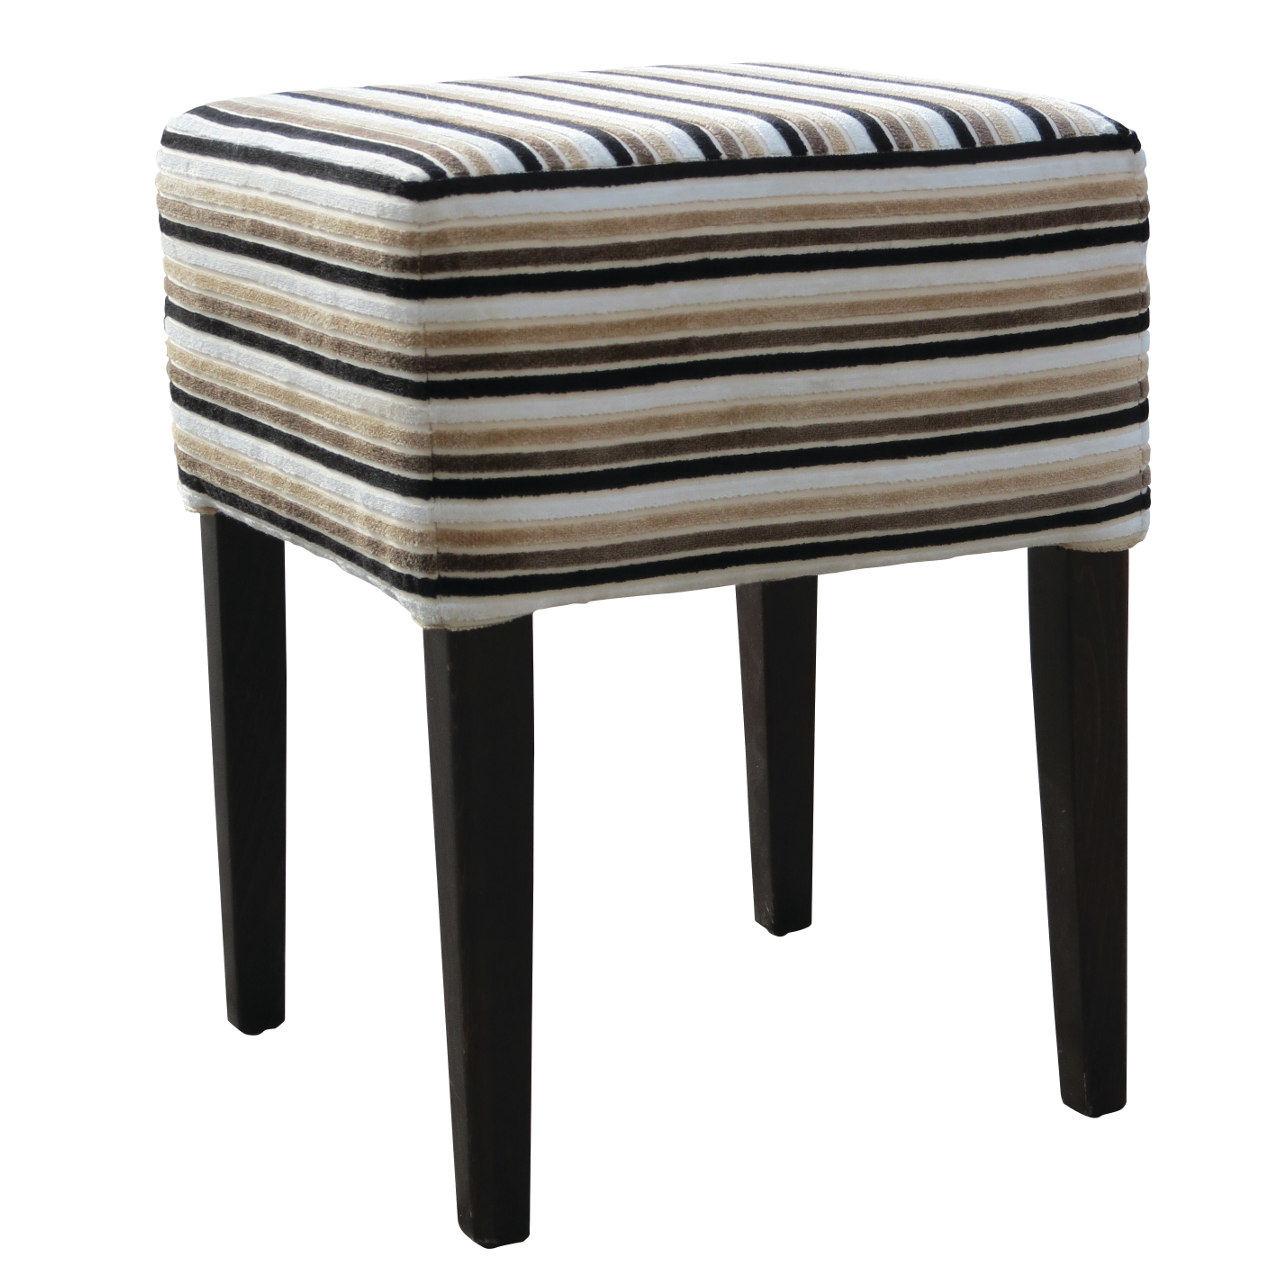 dj low stool, pub furniture, bar furniture, restaurant furniture, contract furniture